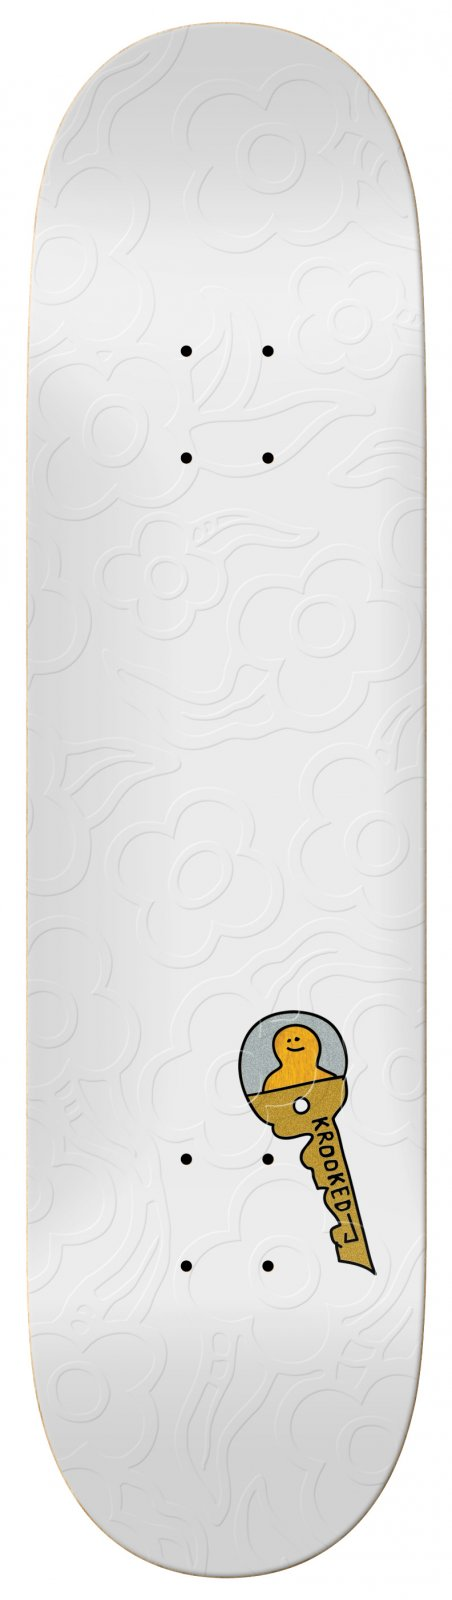 Krooked Kee Slick 8.25 x 32 Skateboard Deck